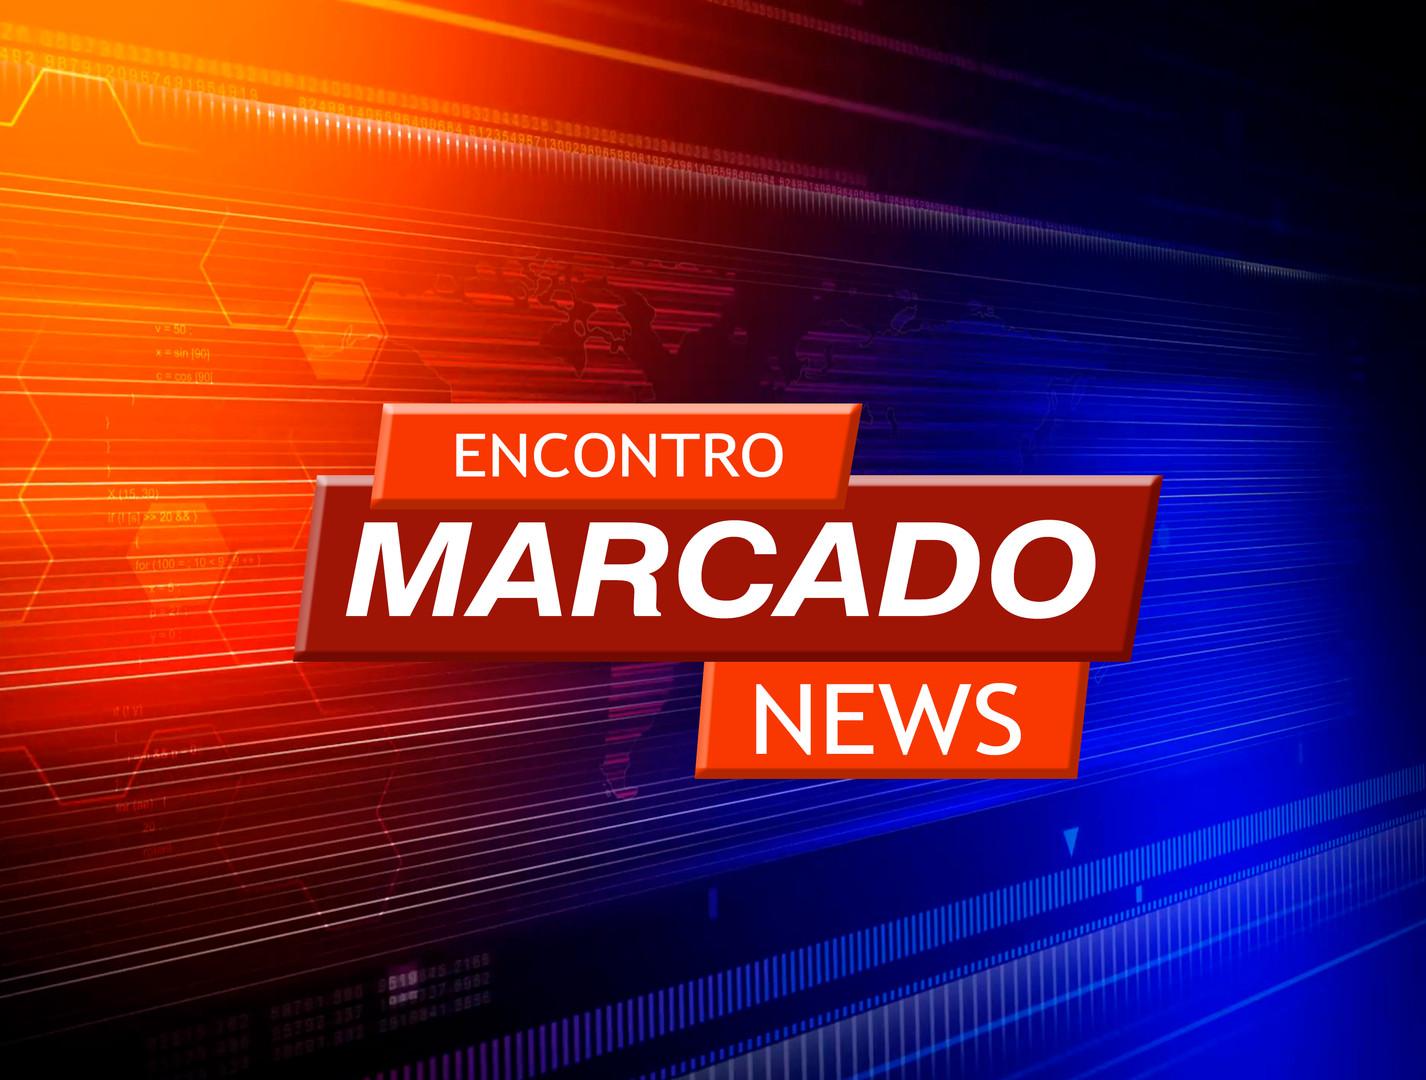 ENCONTRO MARCADO NEWS.jpg